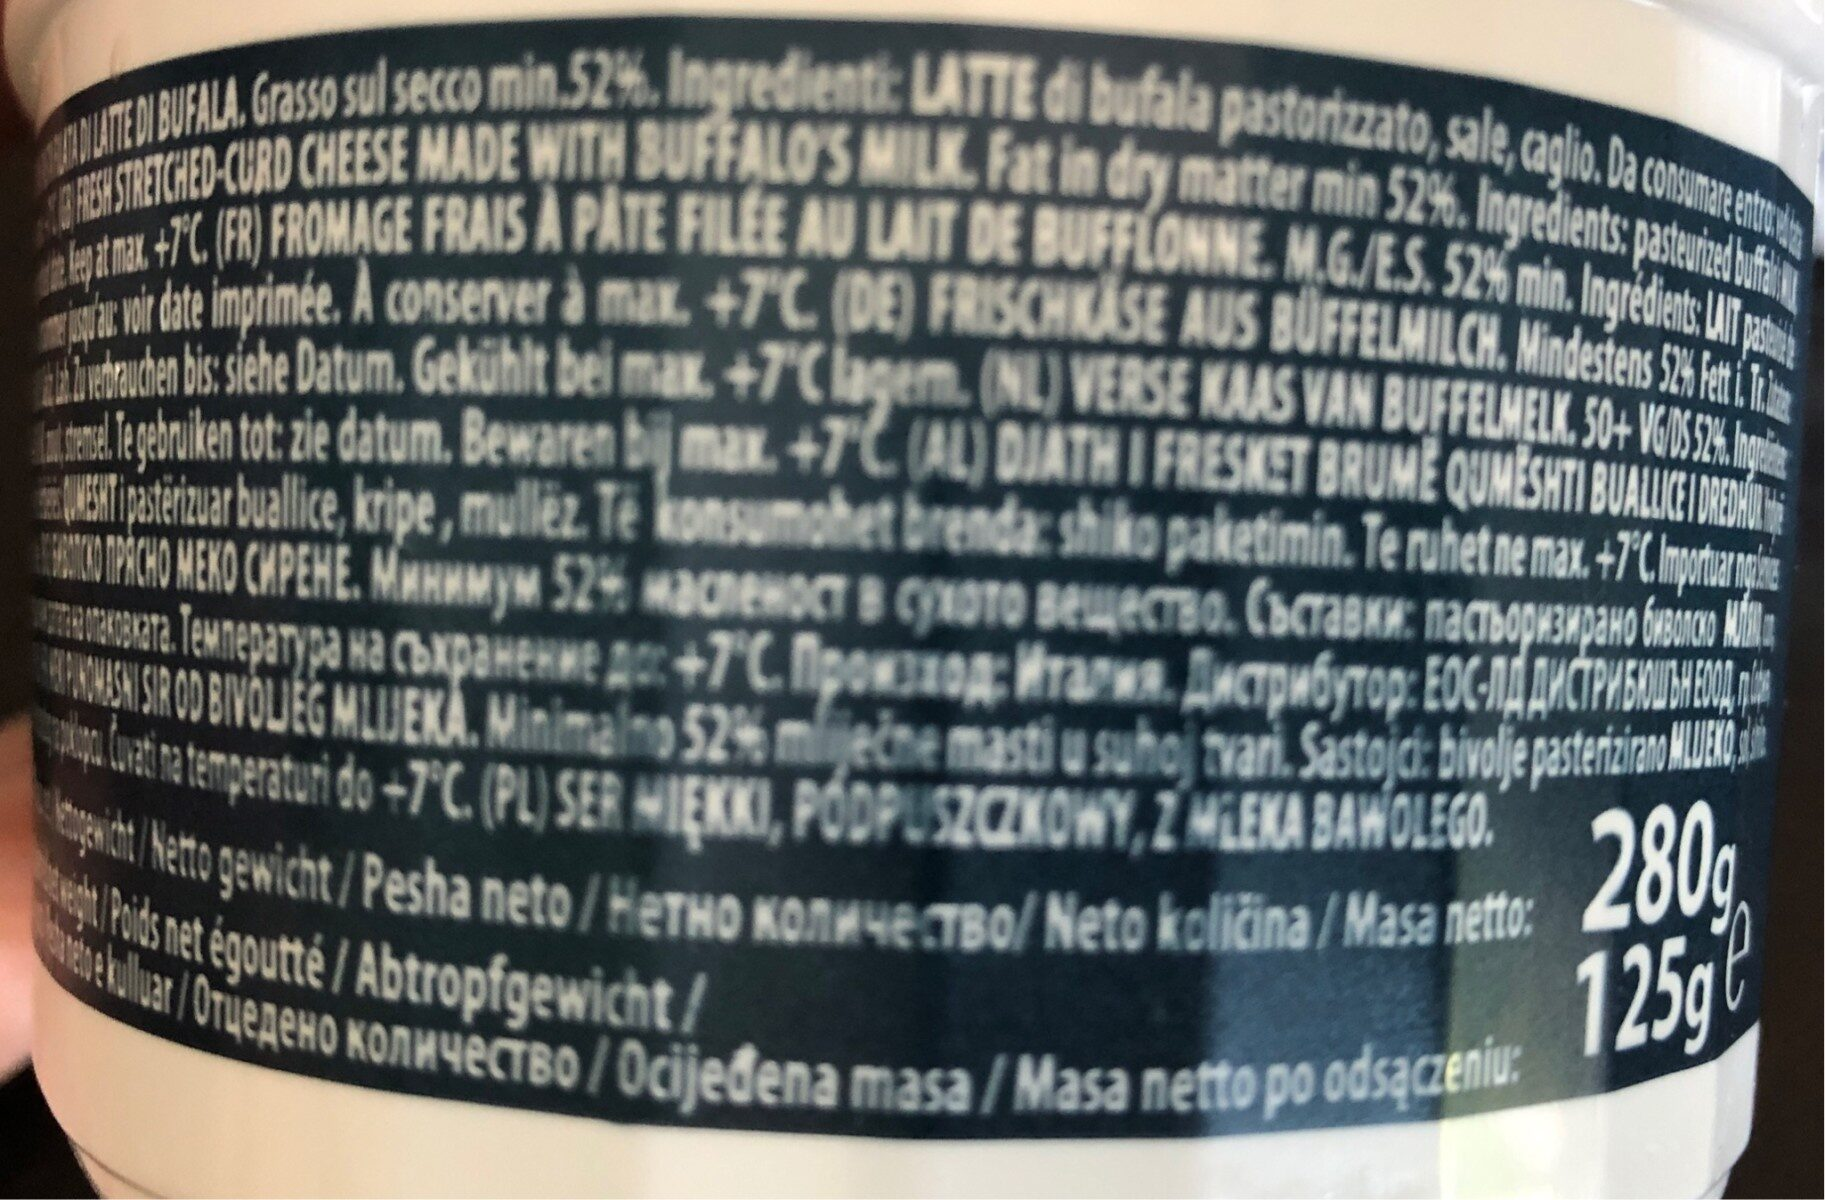 Zanetti Fresh Mozarella Cheese Buffalo Cup (125 G) - Ingredients - nl